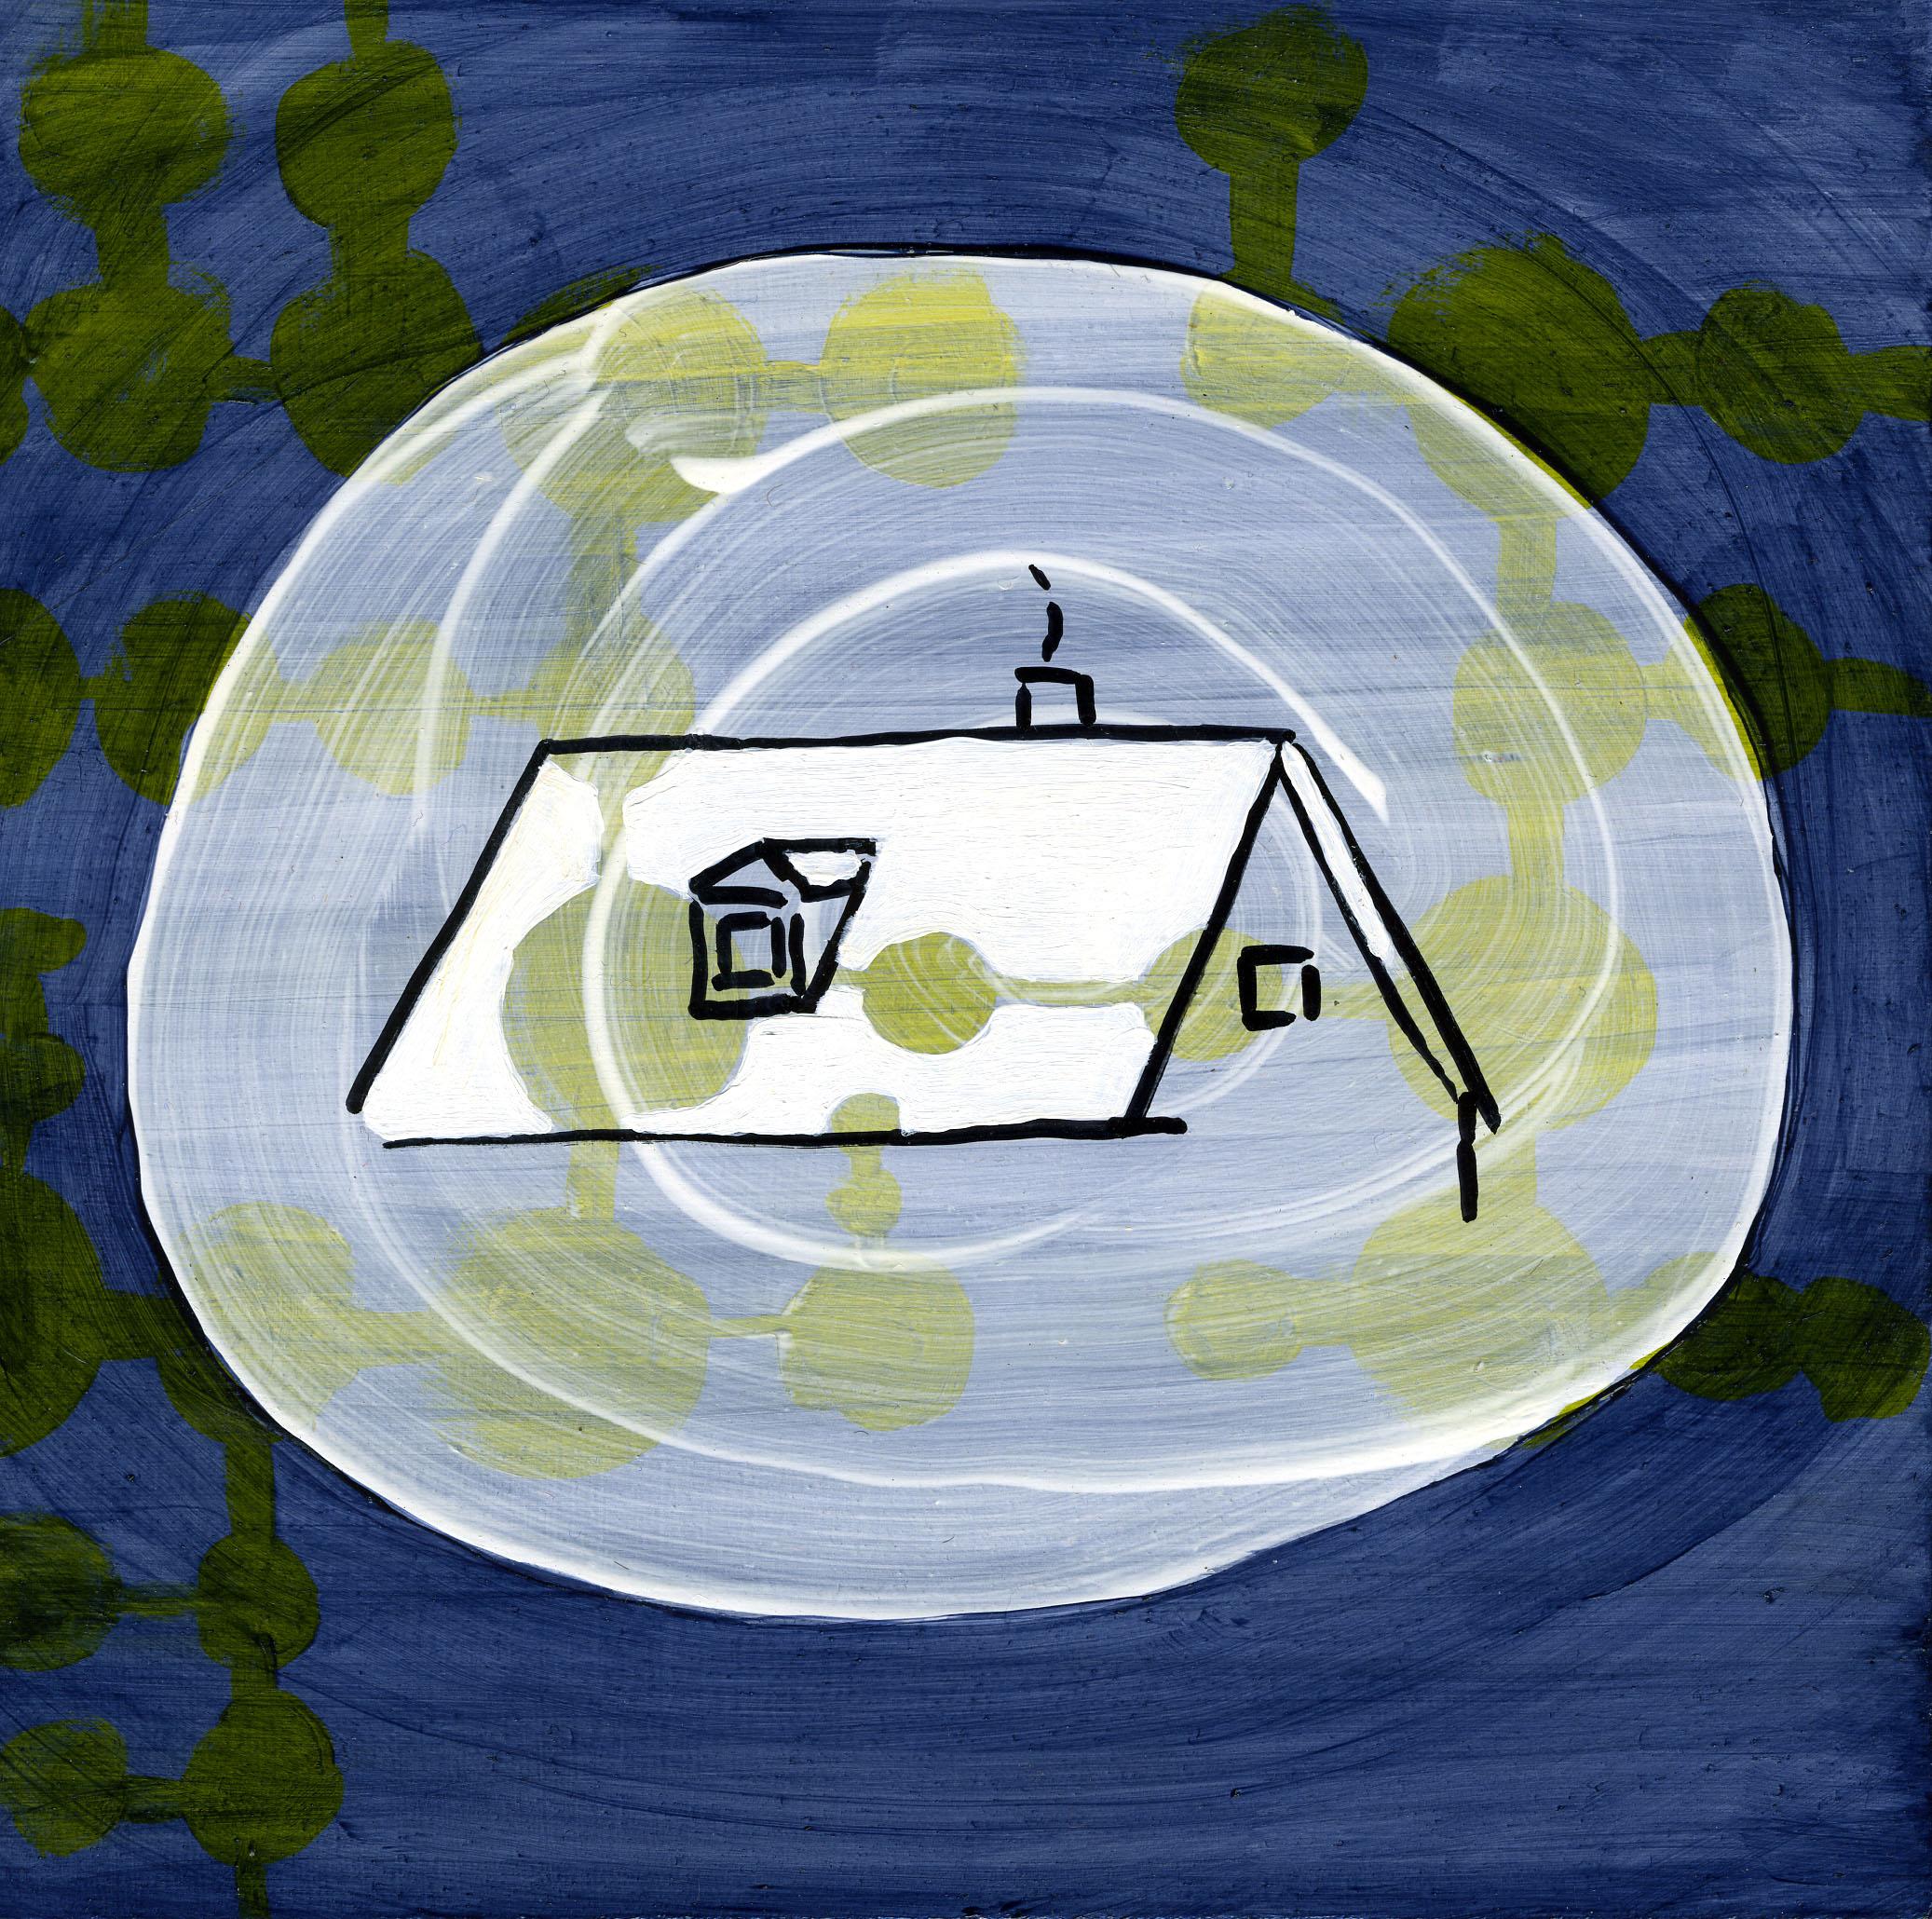 Dormer: Constellation of Understanding #1 2007